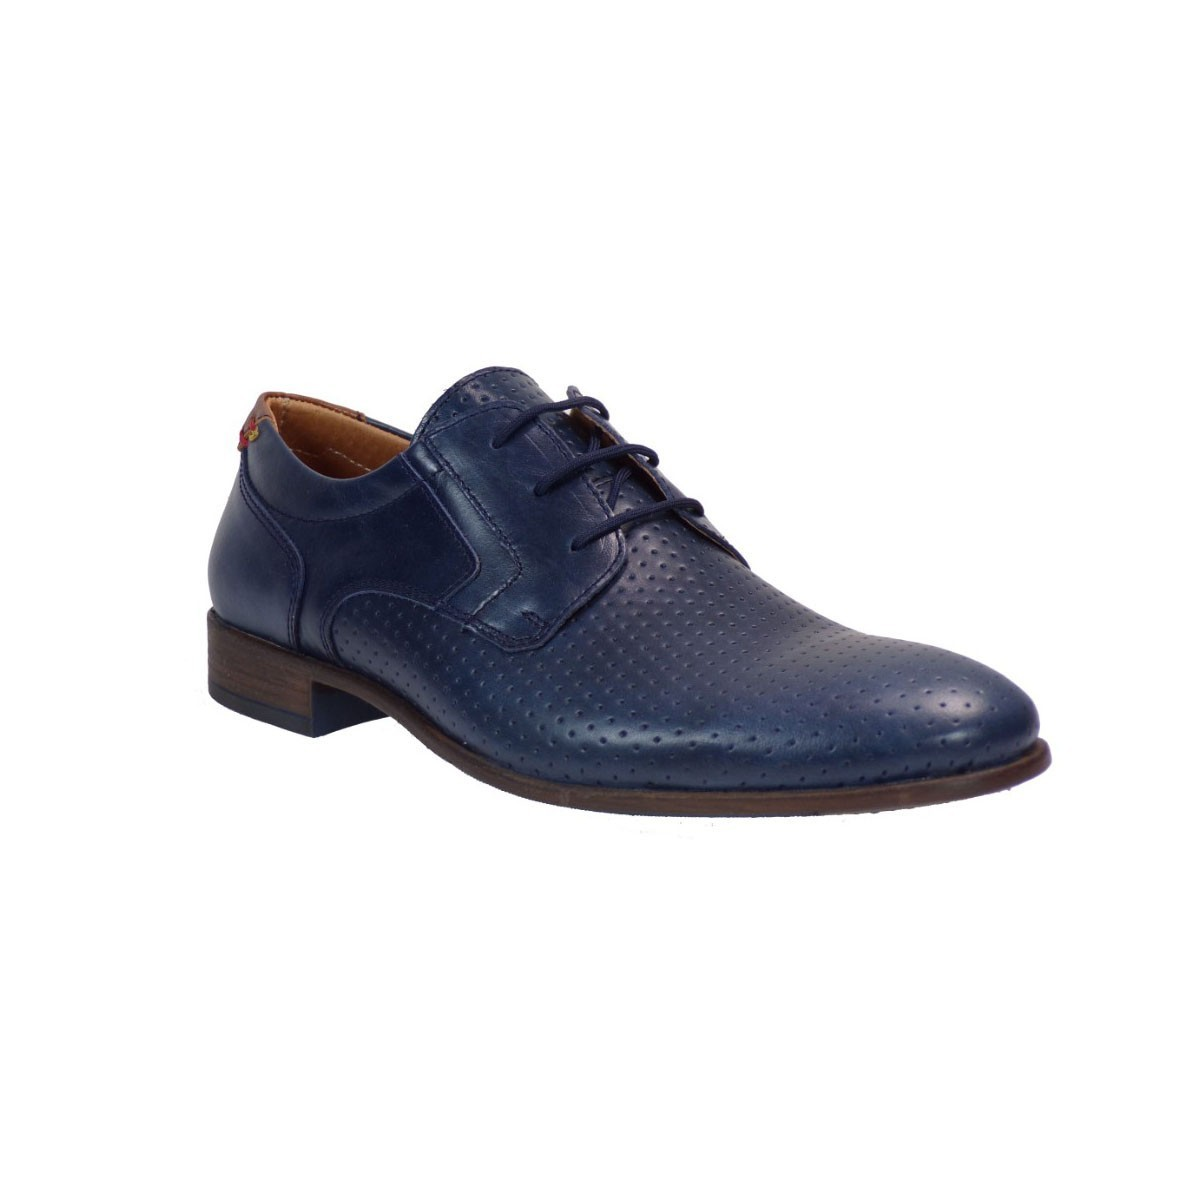 Commanchero Ανδρικά Παπούτσια 91629-527 Μπλε Commanchero 91629-527 Μπλε